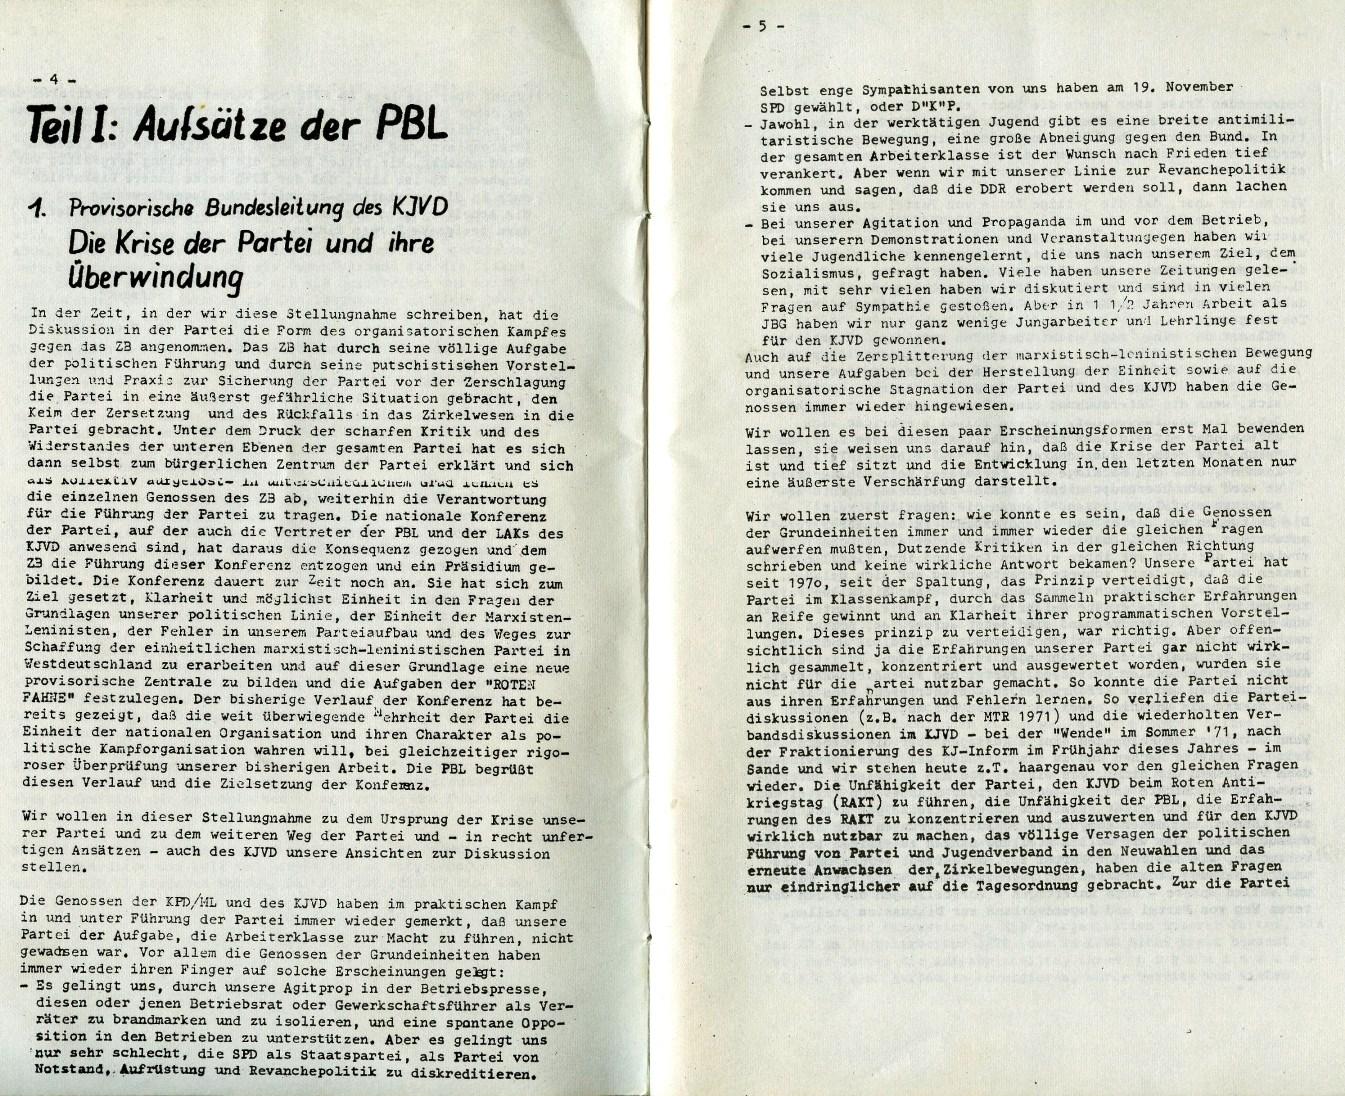 ZB_Universitas_1972_06